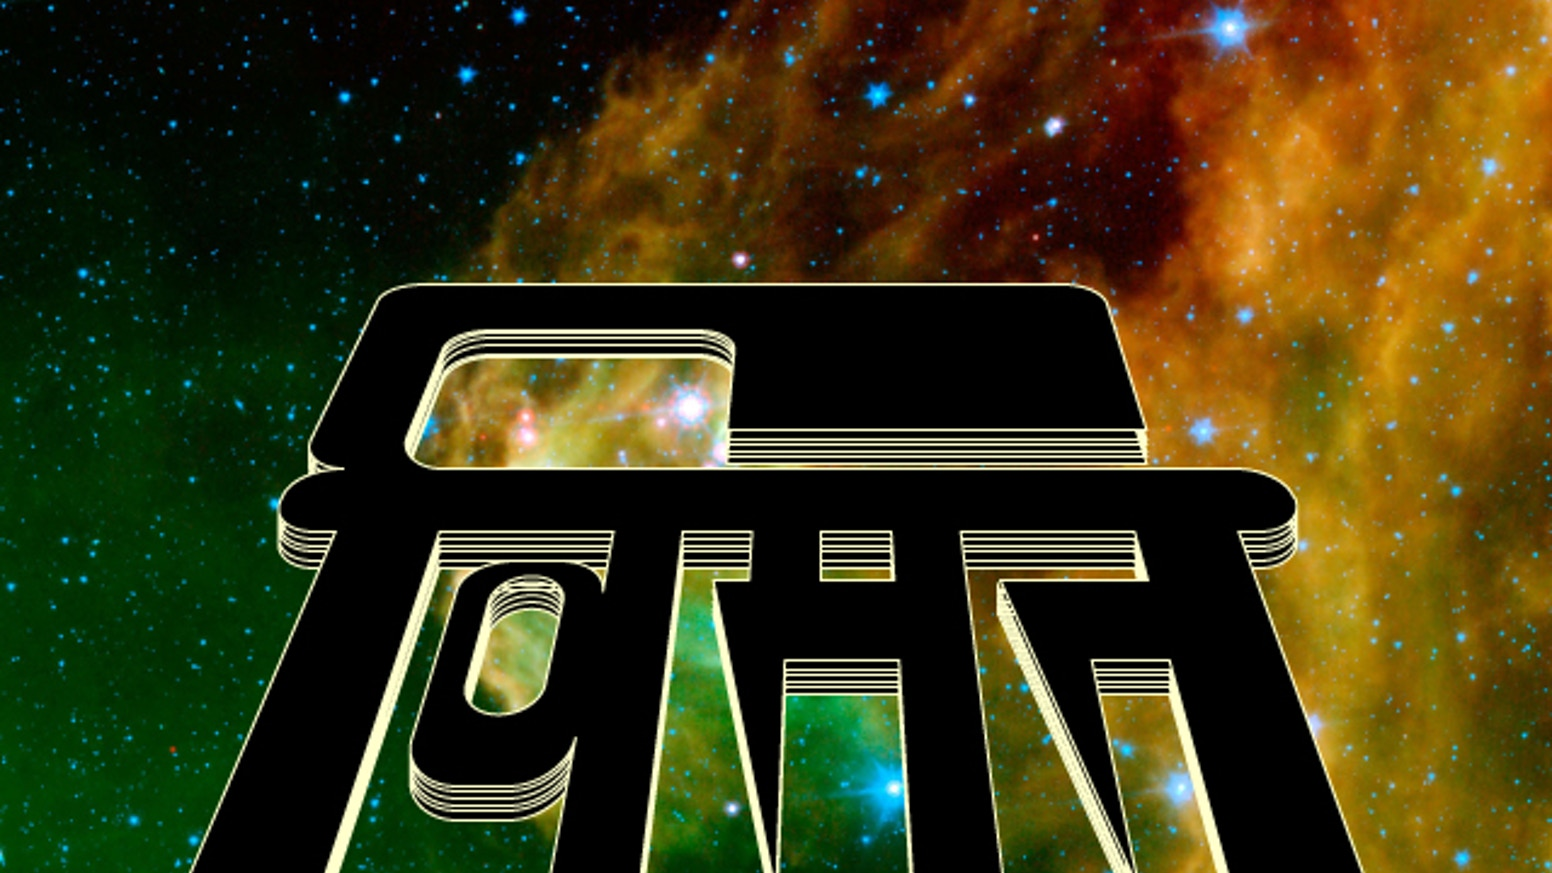 Vimana a sci fi short film by faroukh virani kickstarter vimana a sci fi short film m4hsunfo